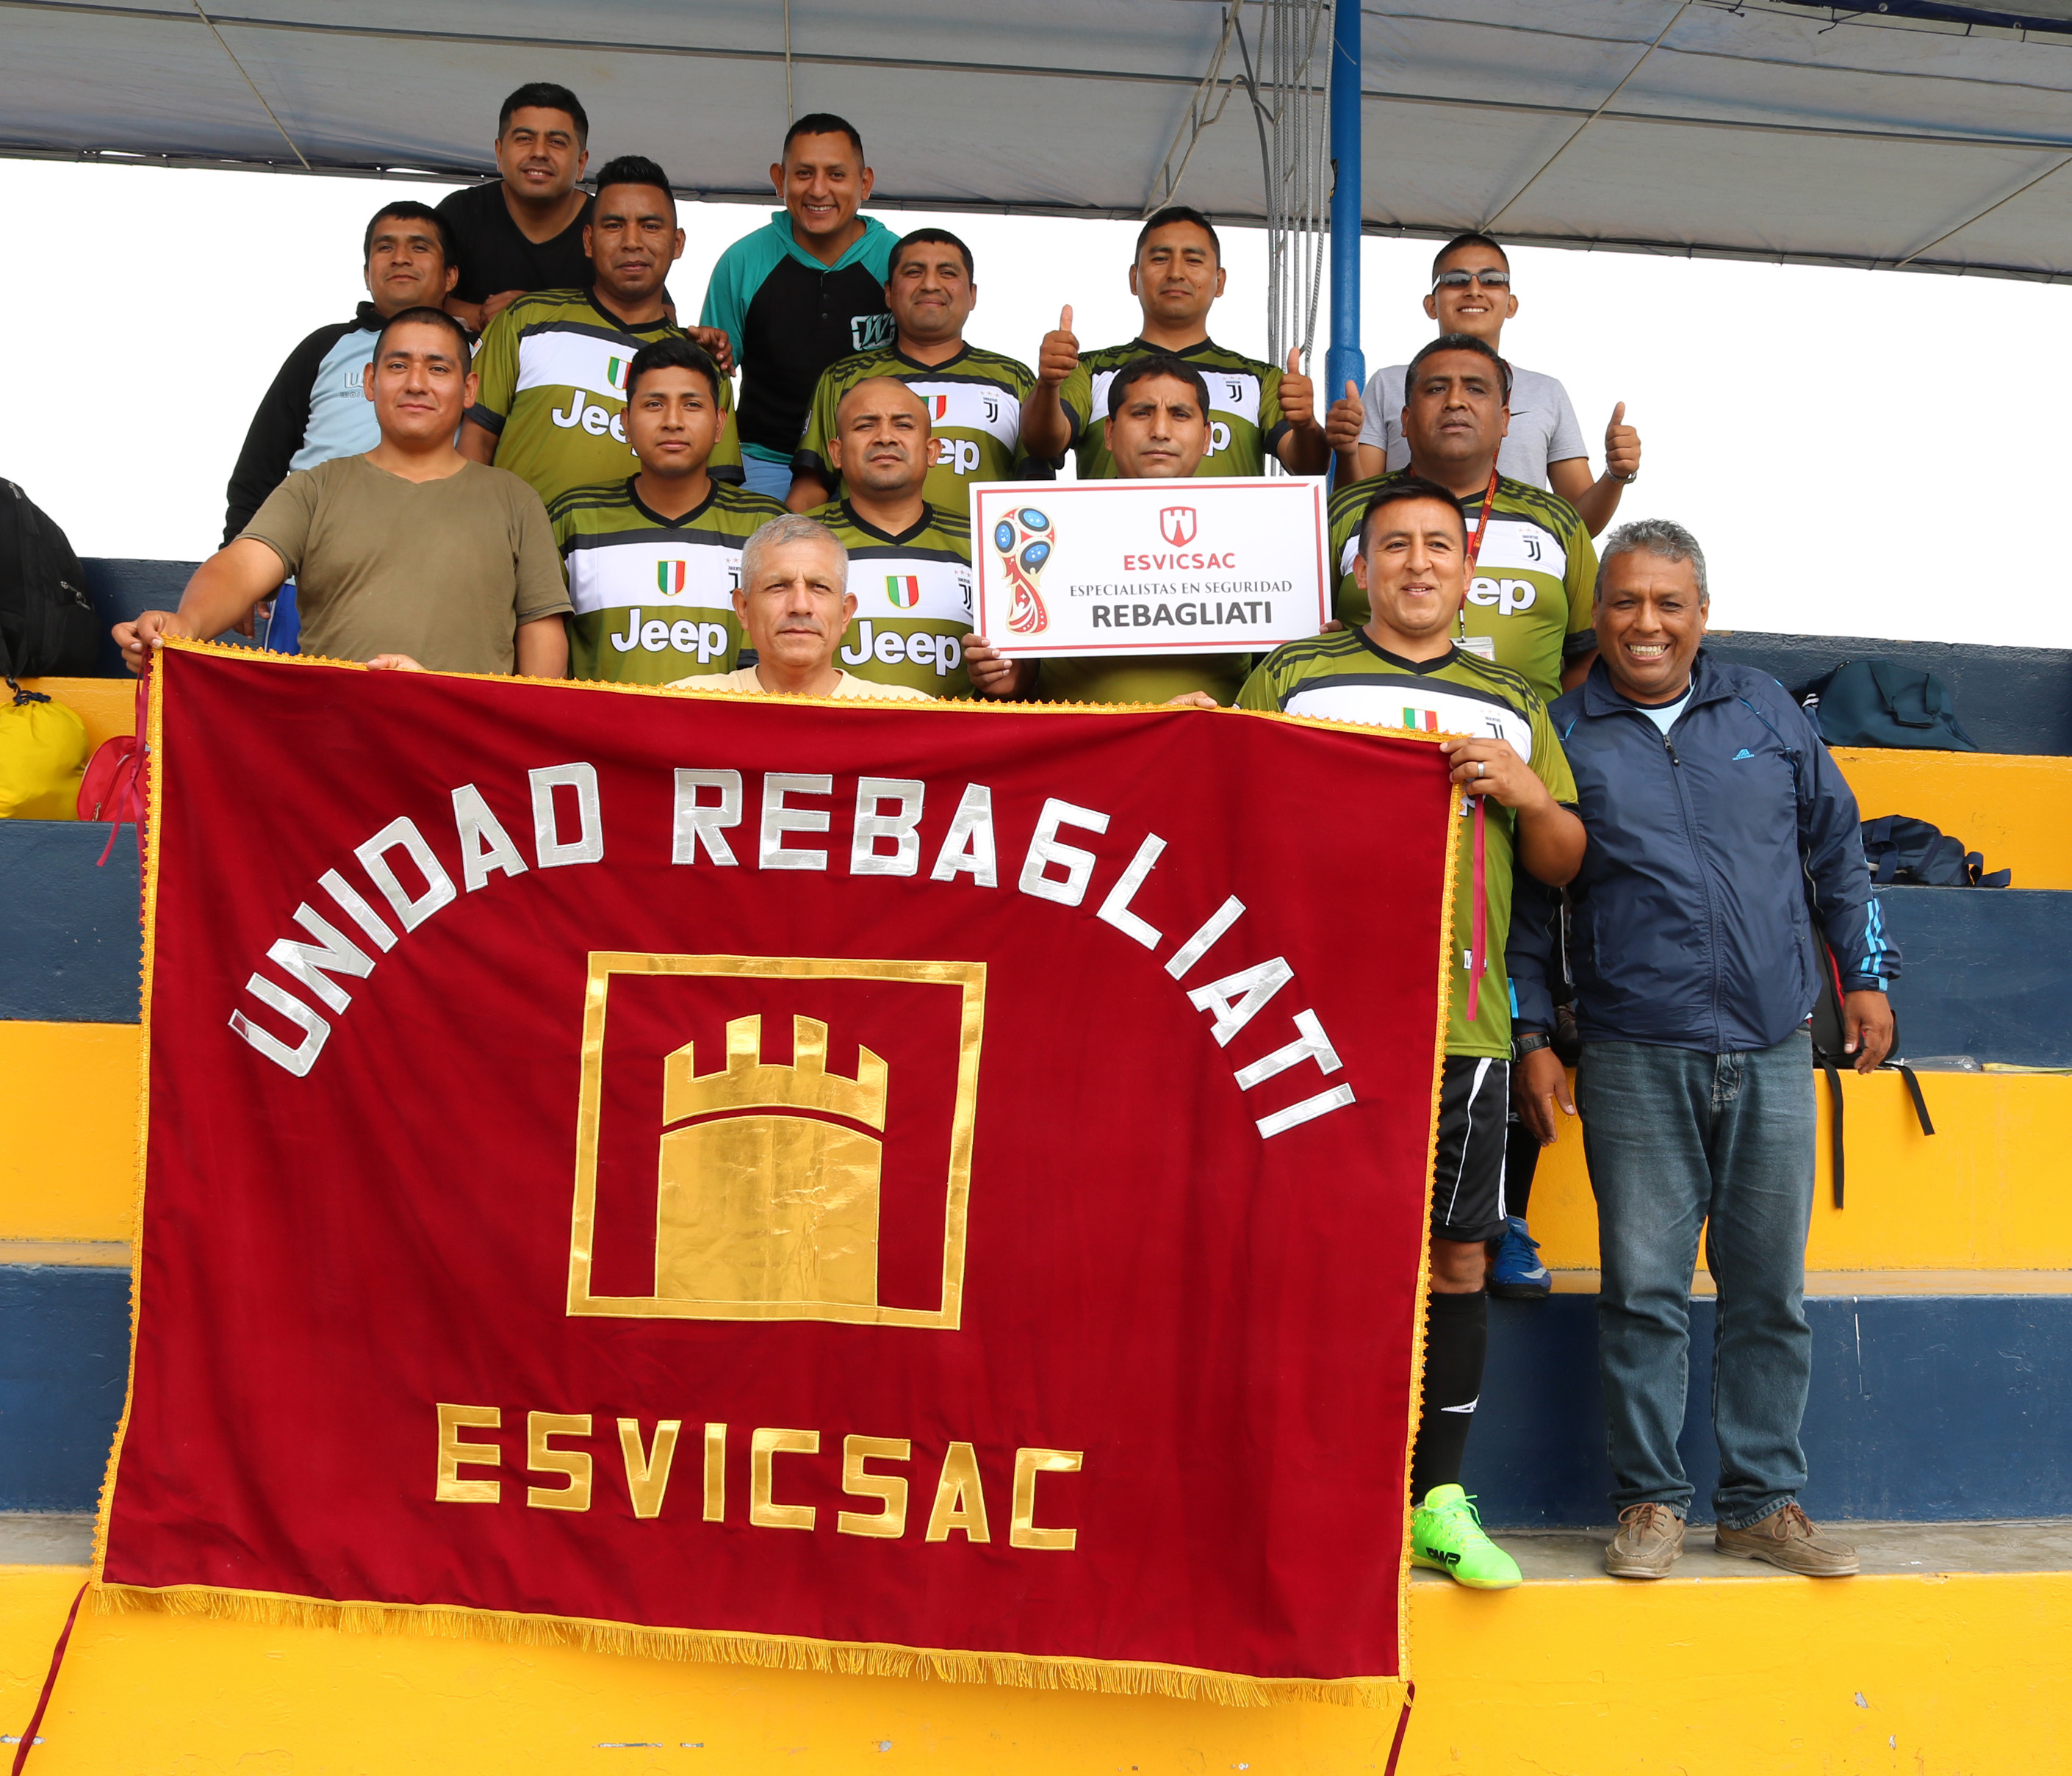 Inauguraci³n Del Mundialito ESVICSAC 2018 – ESVICSAC